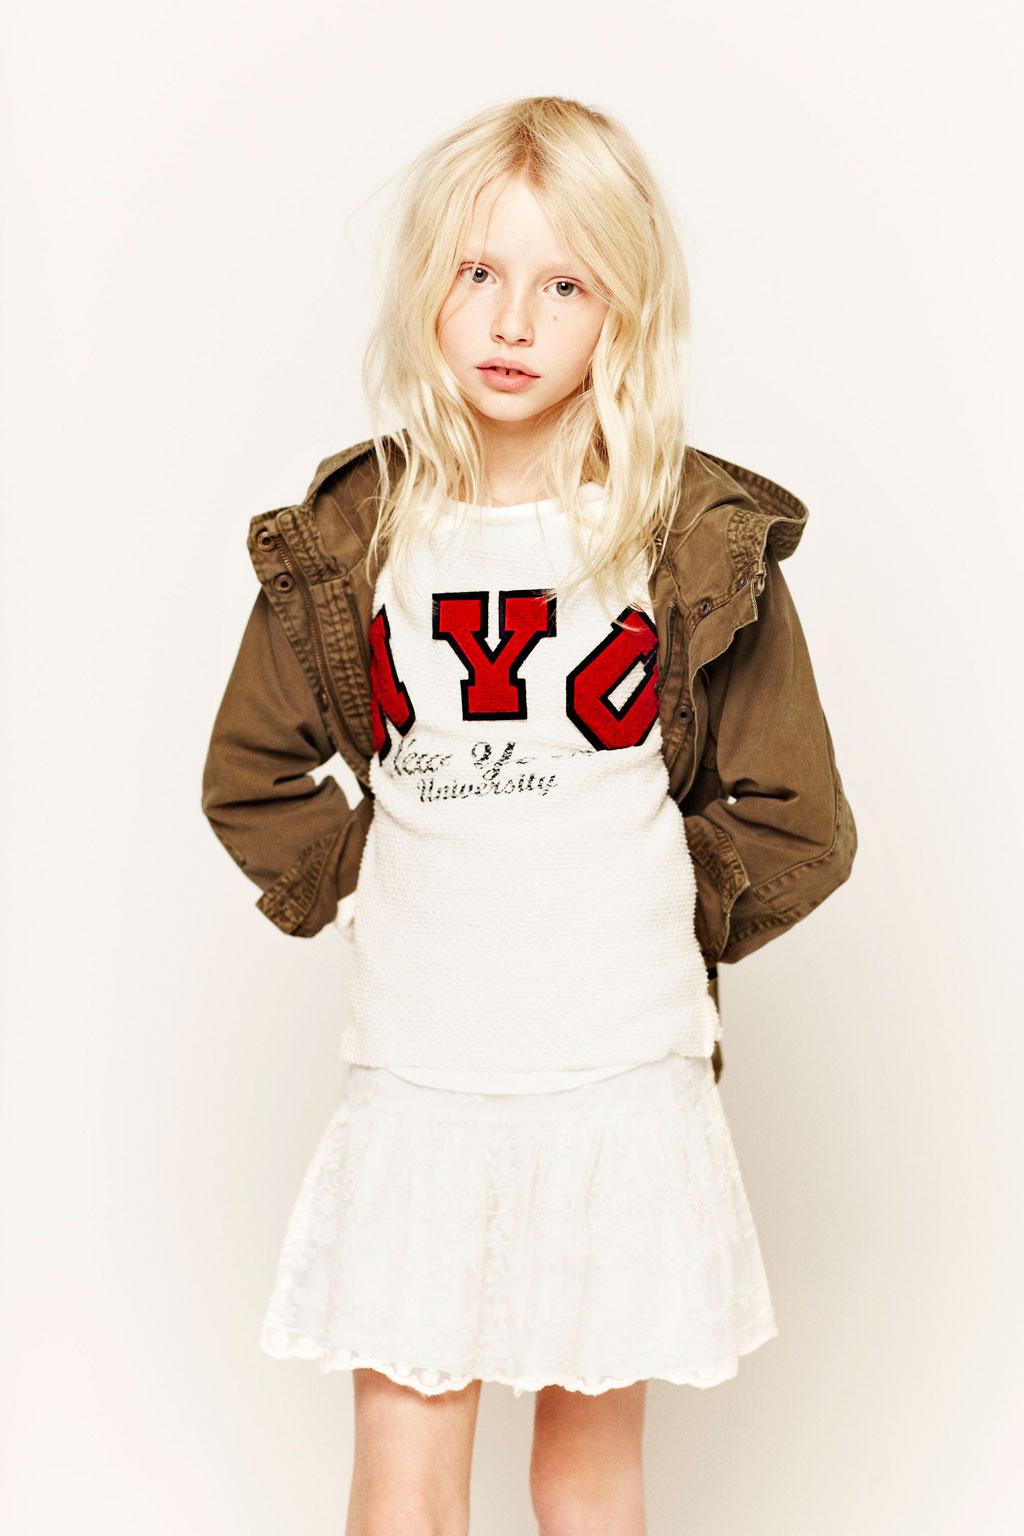 zara fashion Zara fashion - zara is one of the largest international fashion companies.